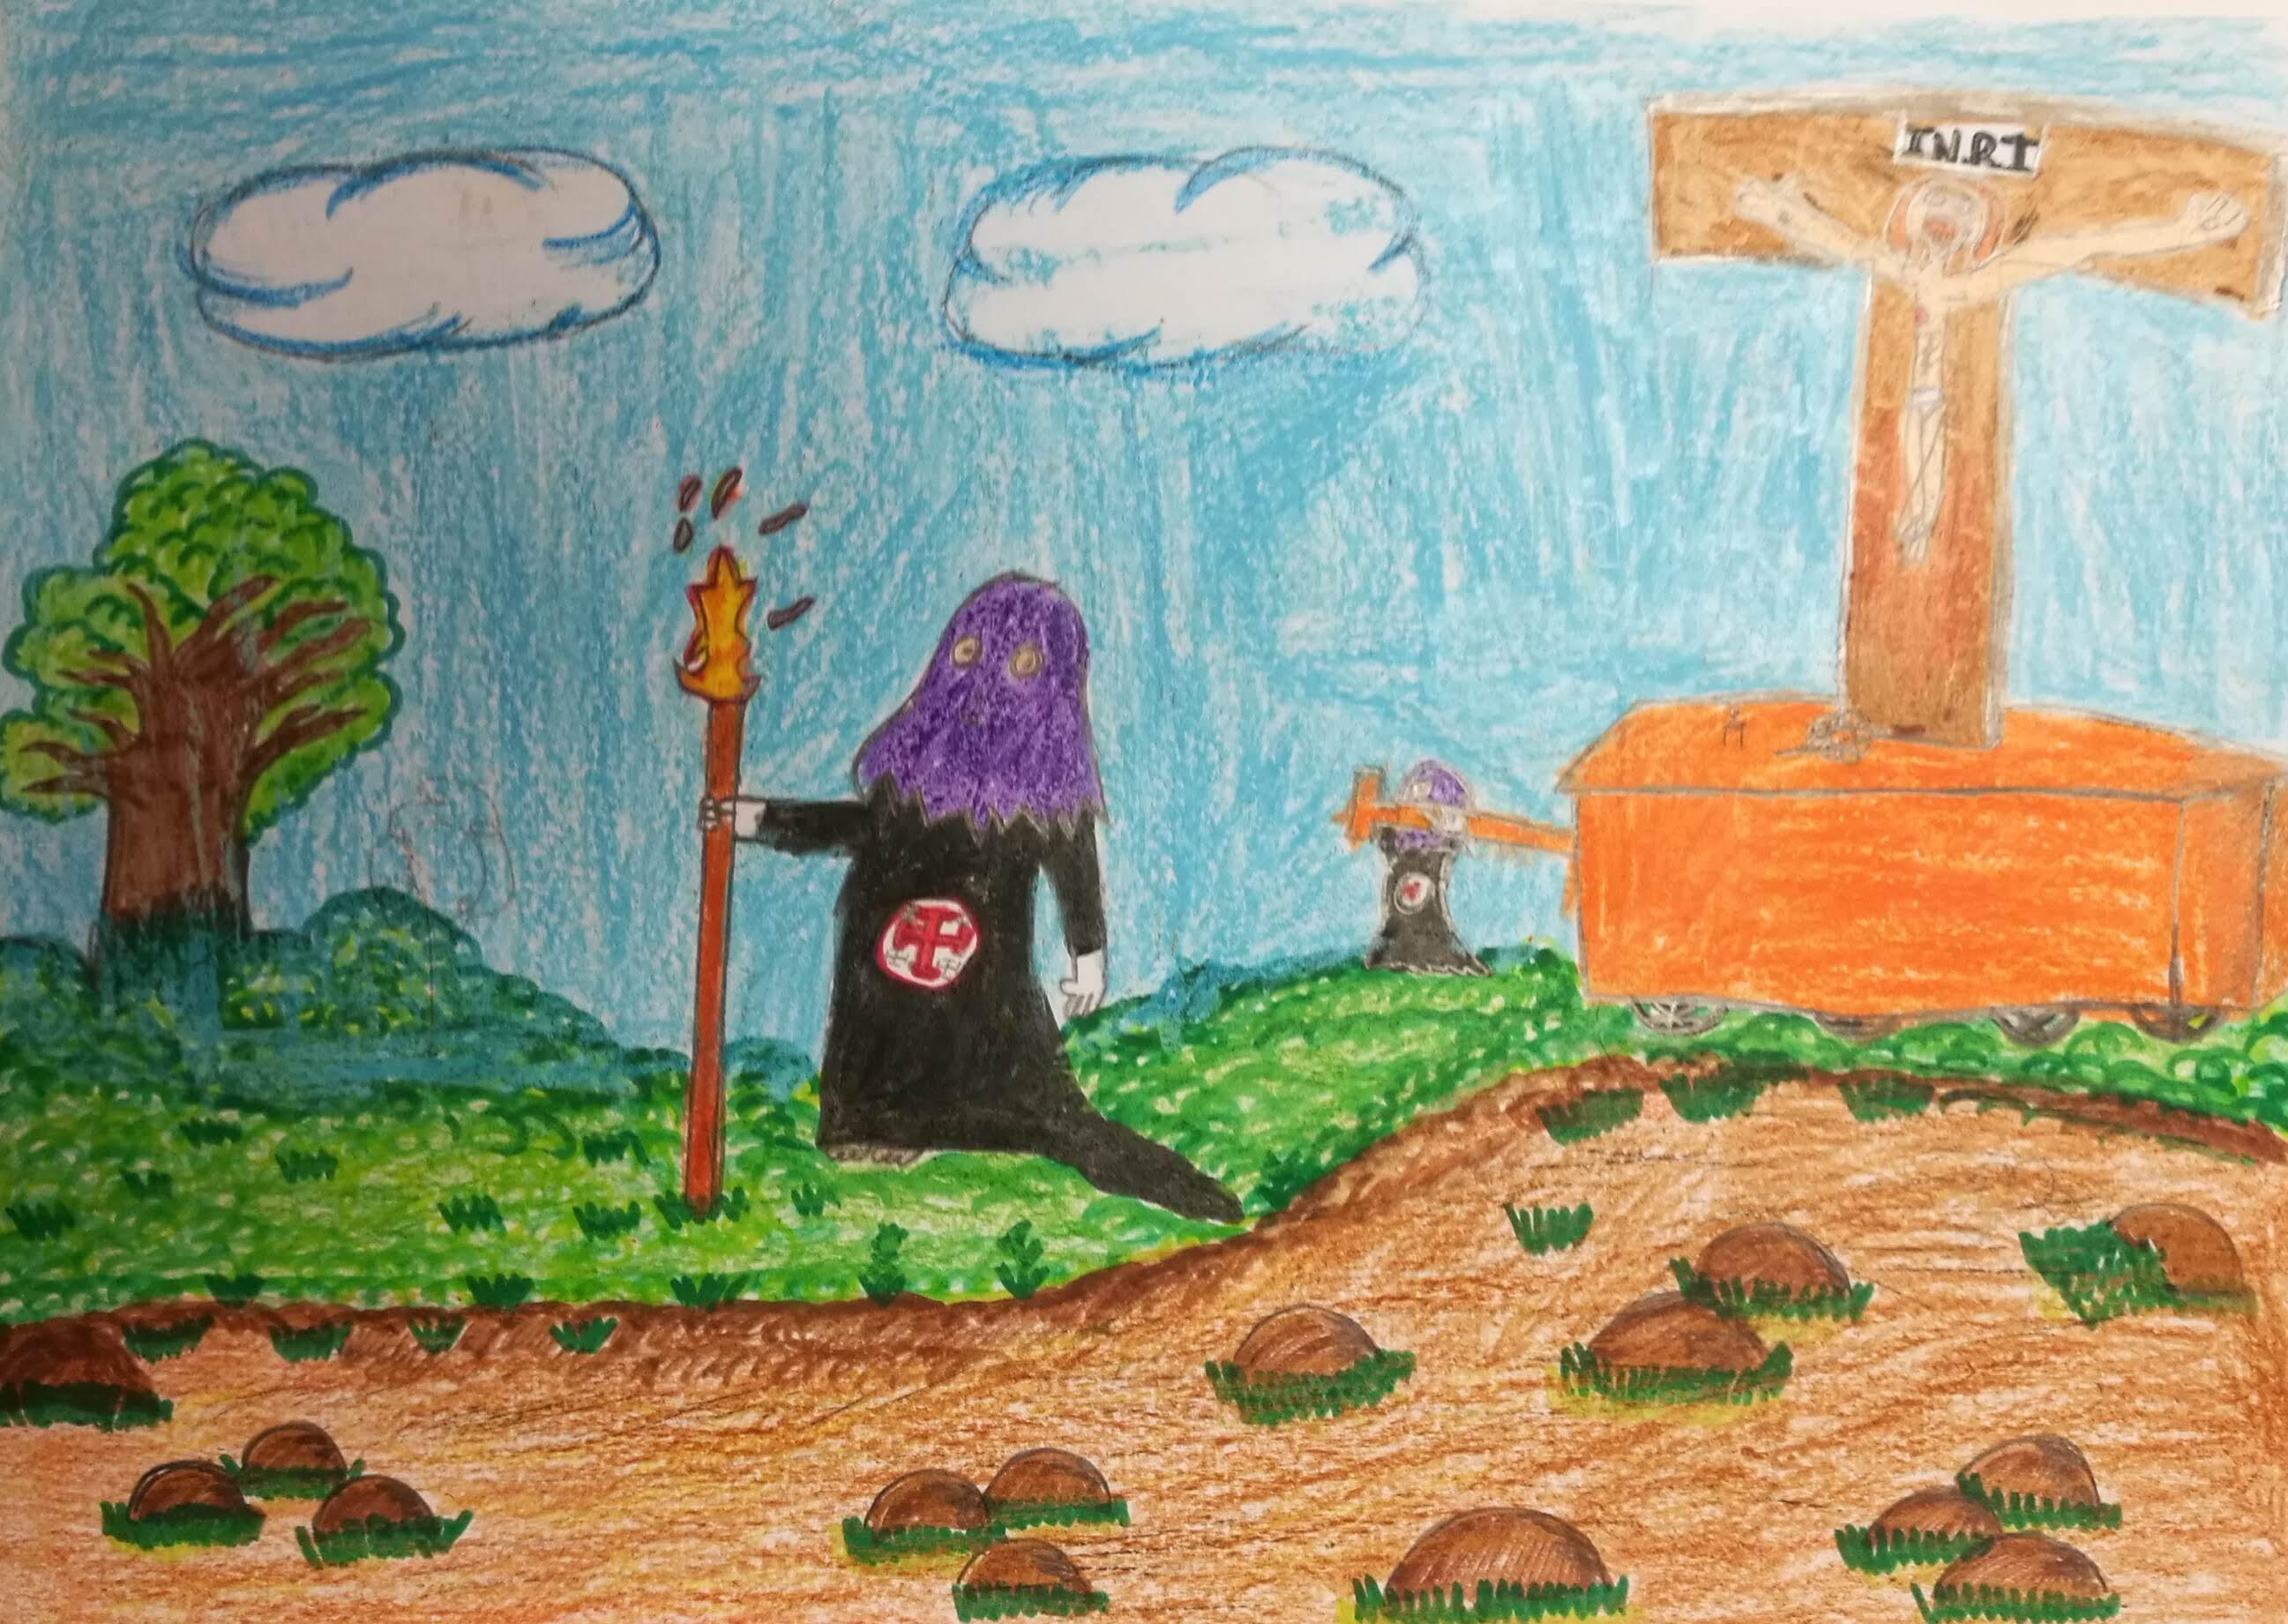 Ganadores del Concurso Infantil de Dibujo de la Semana Santa 2018